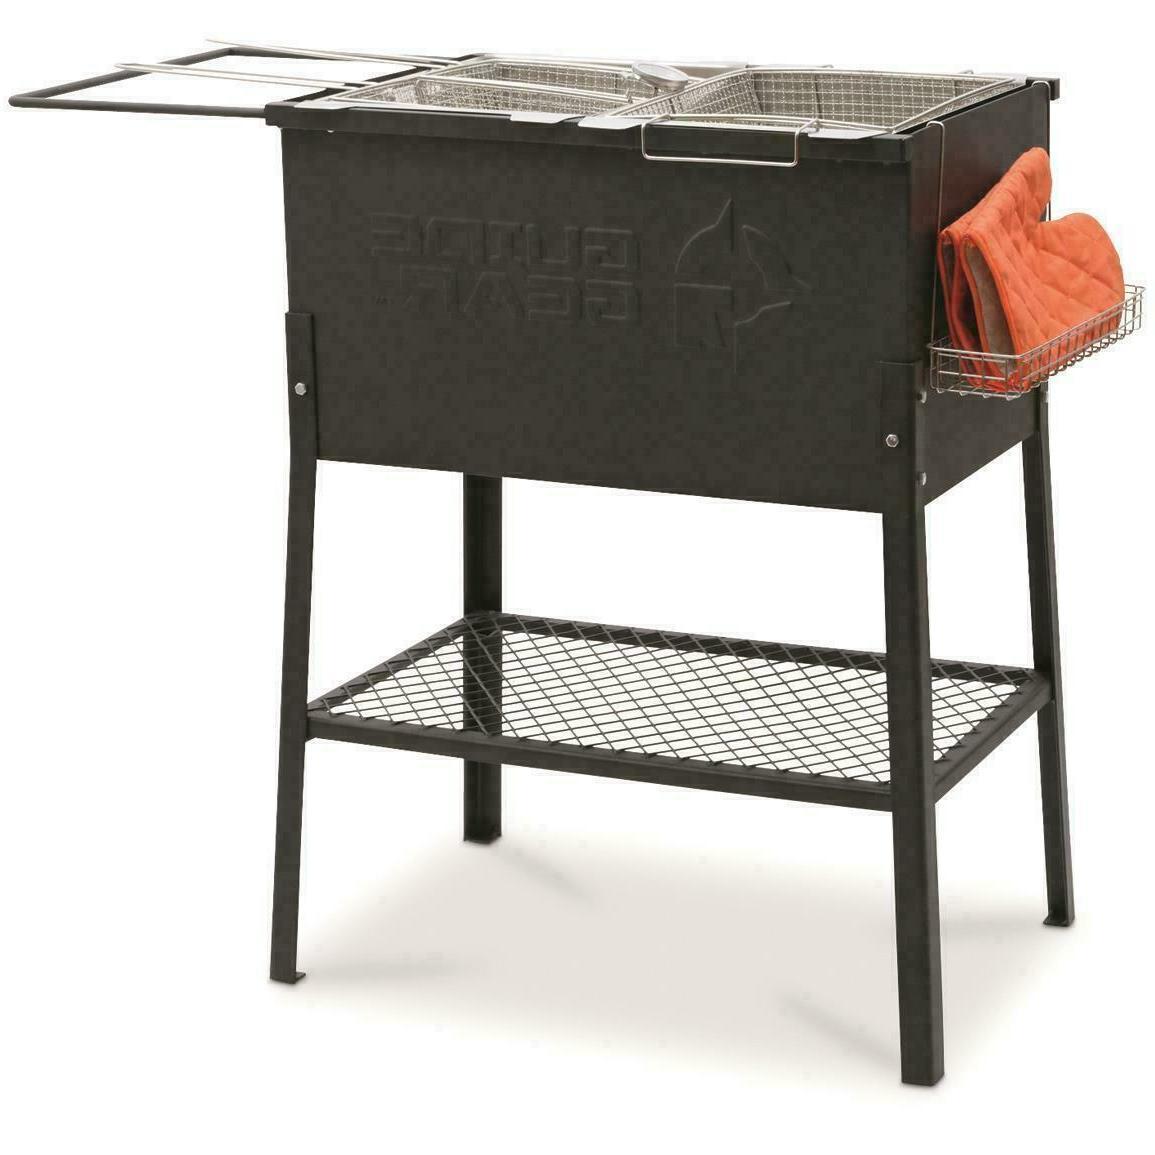 propane deep fryer patio deck cooker camping